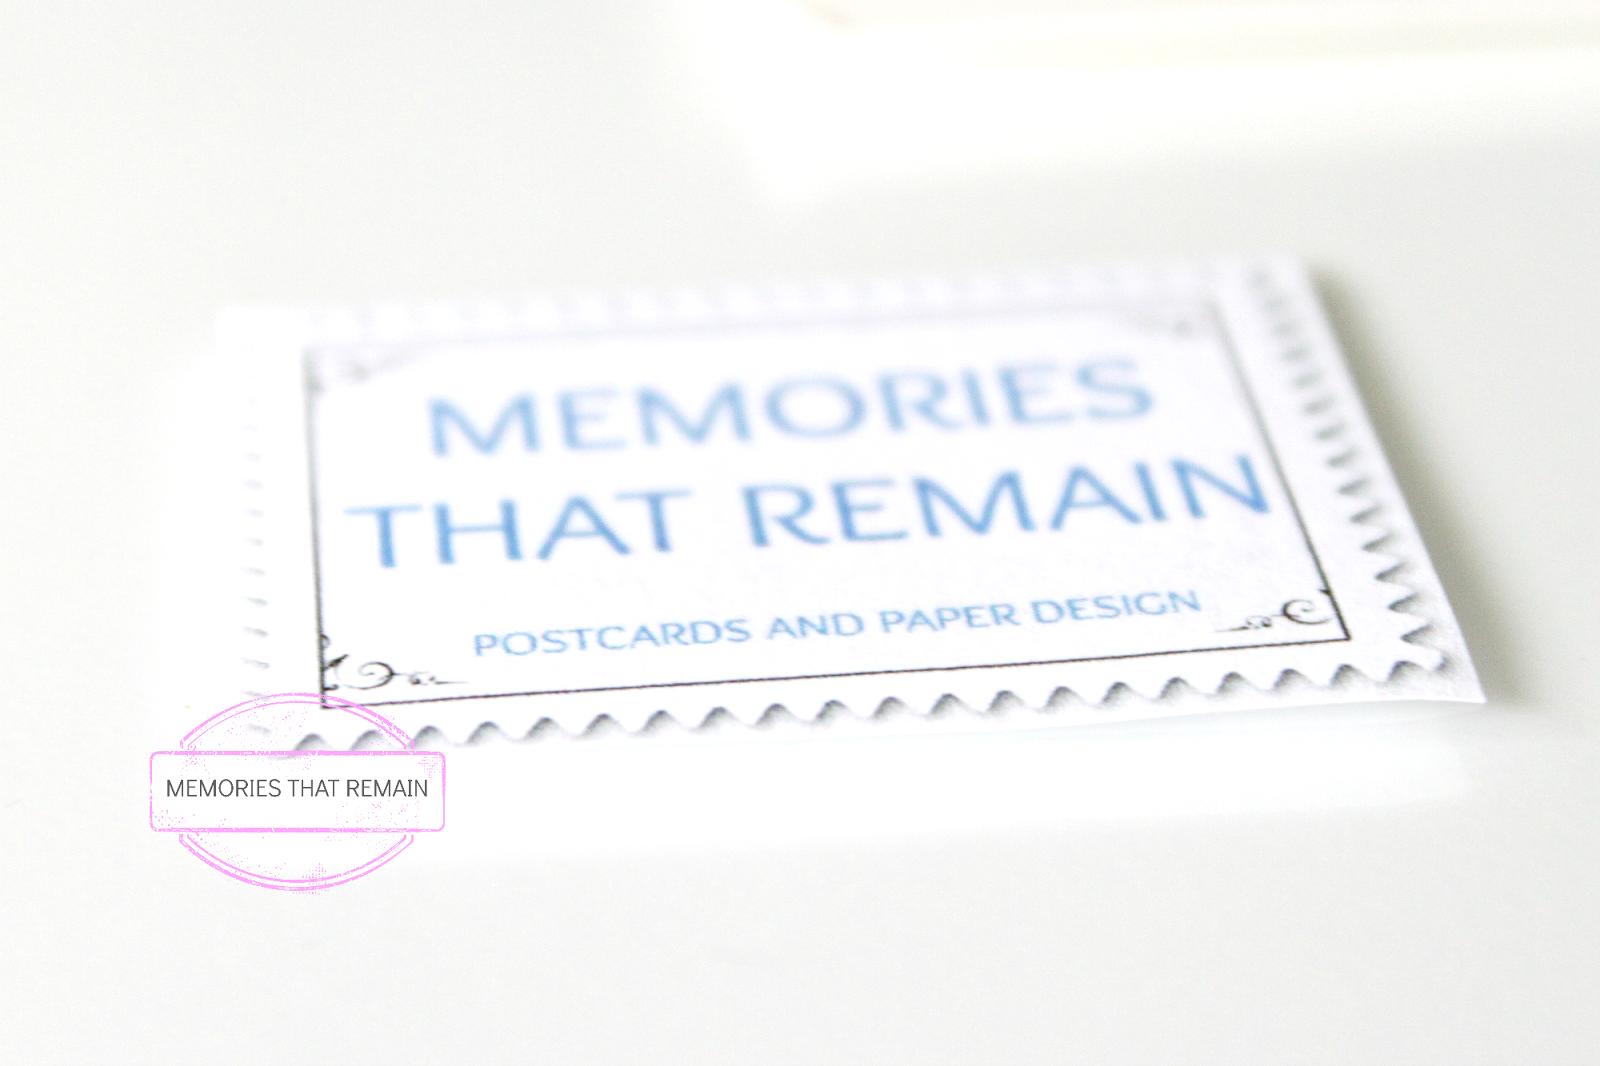 www.memoriesthatremain.com